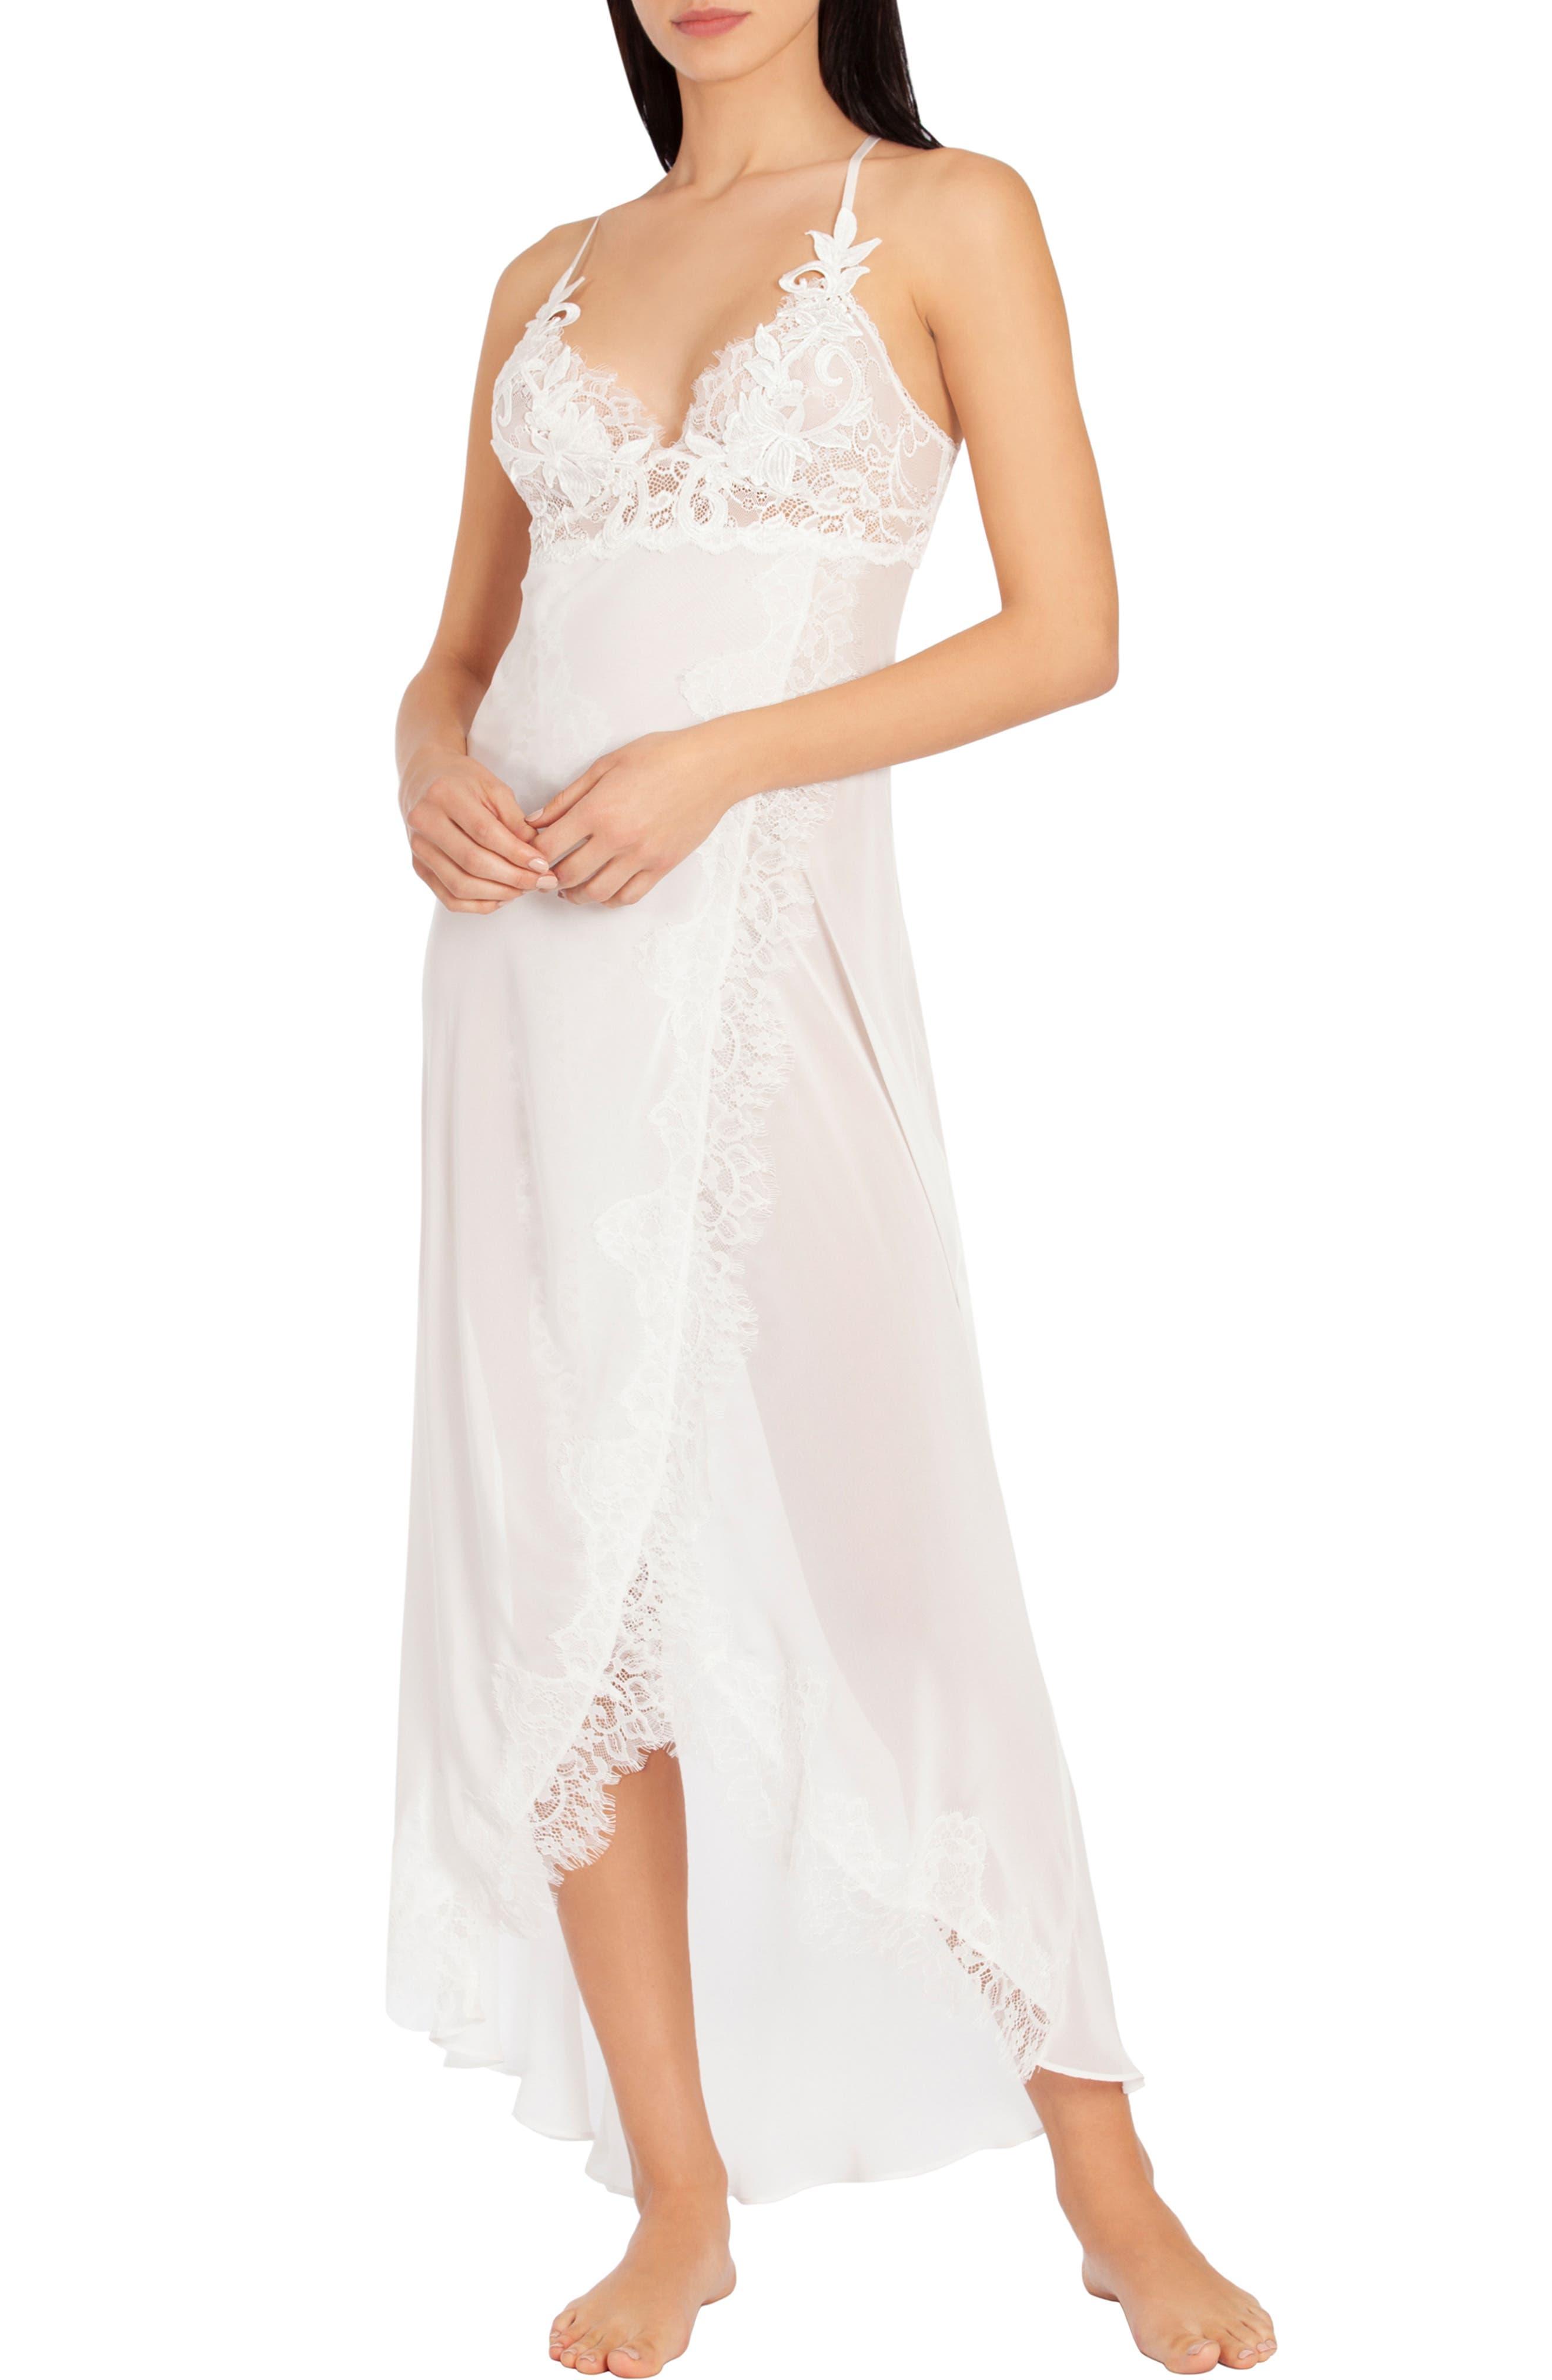 Jonquil Stephanie Chiffon Nightgown, Ivory